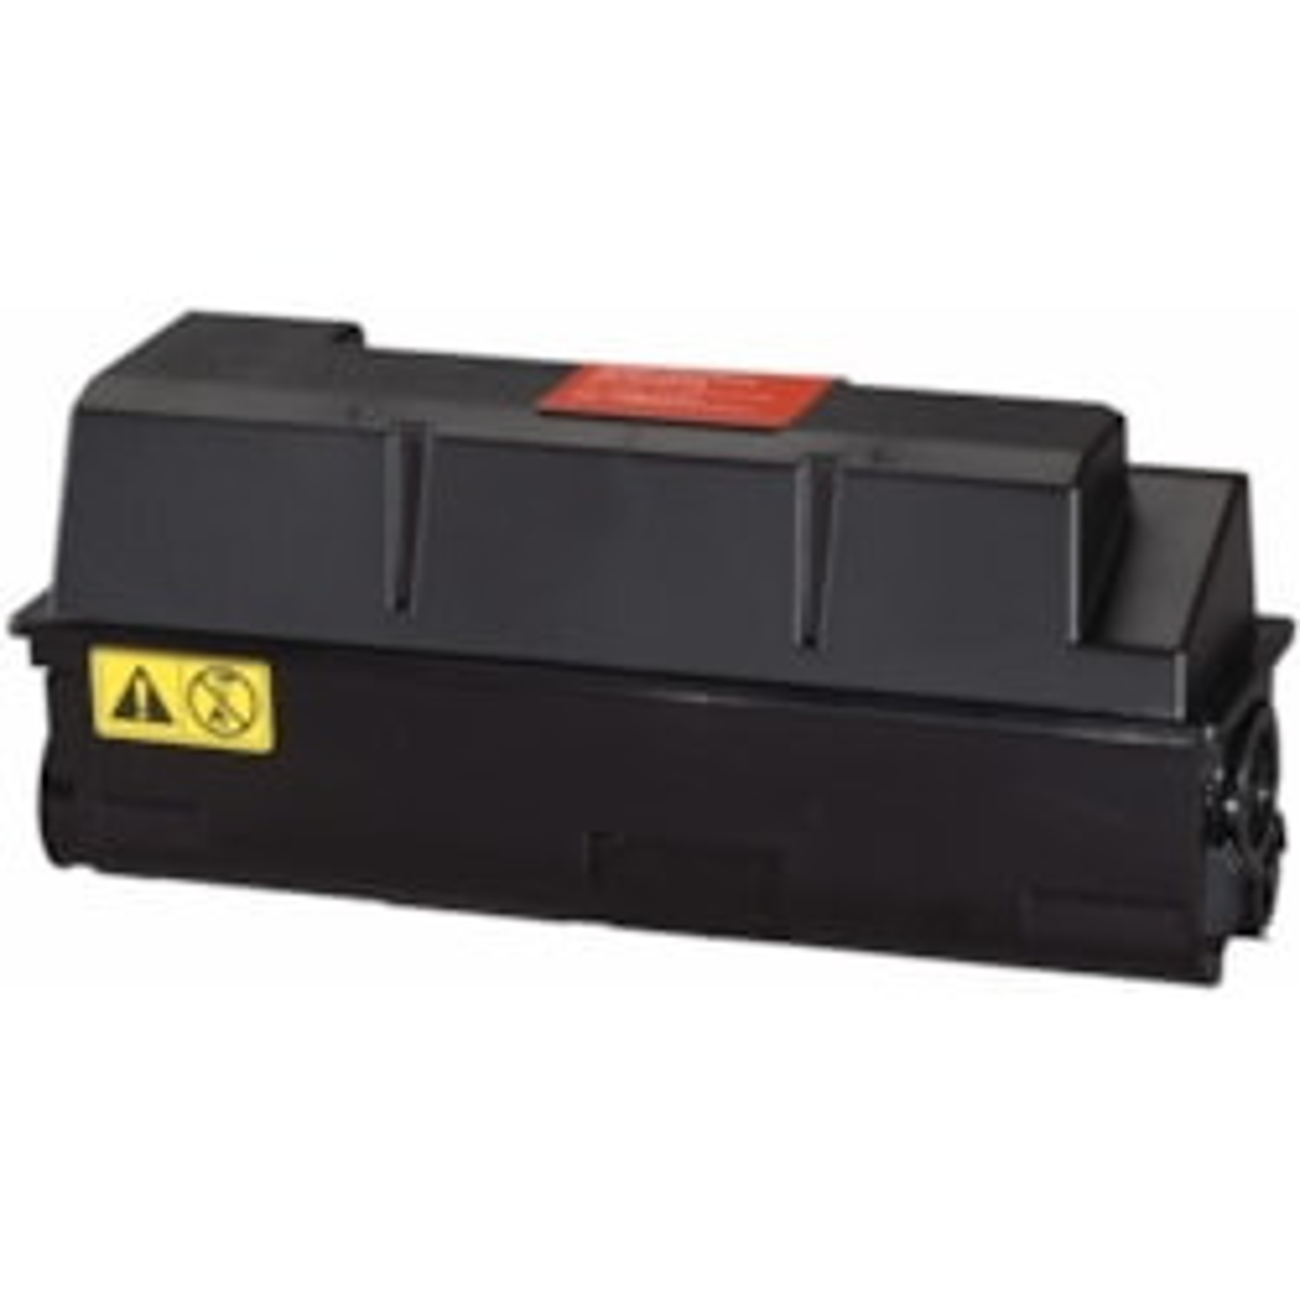 Kyocera TK-330 Original Toner Cartridge - Black